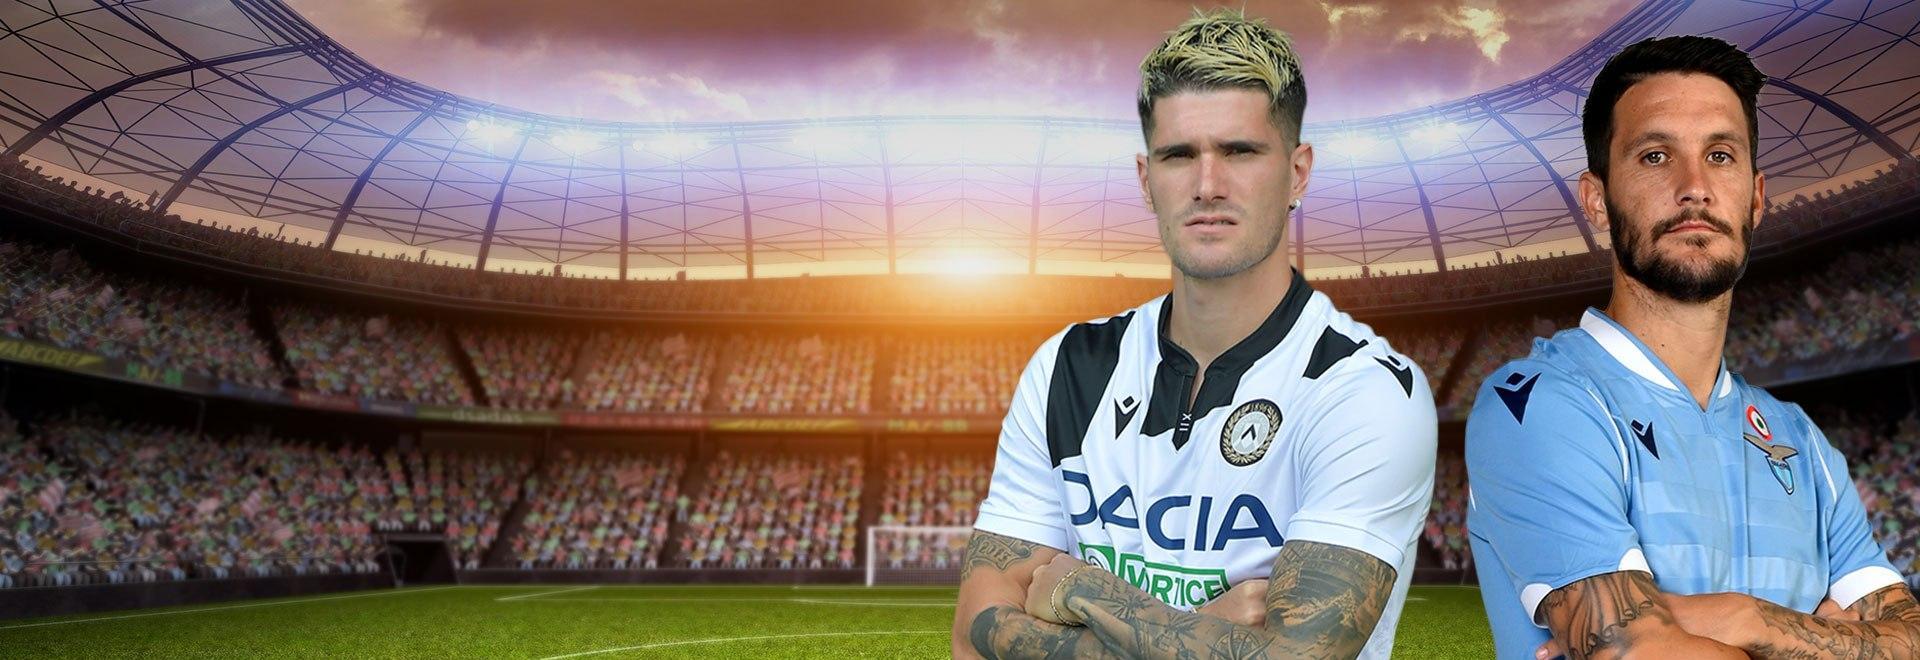 Udinese - Lazio. 33a g.